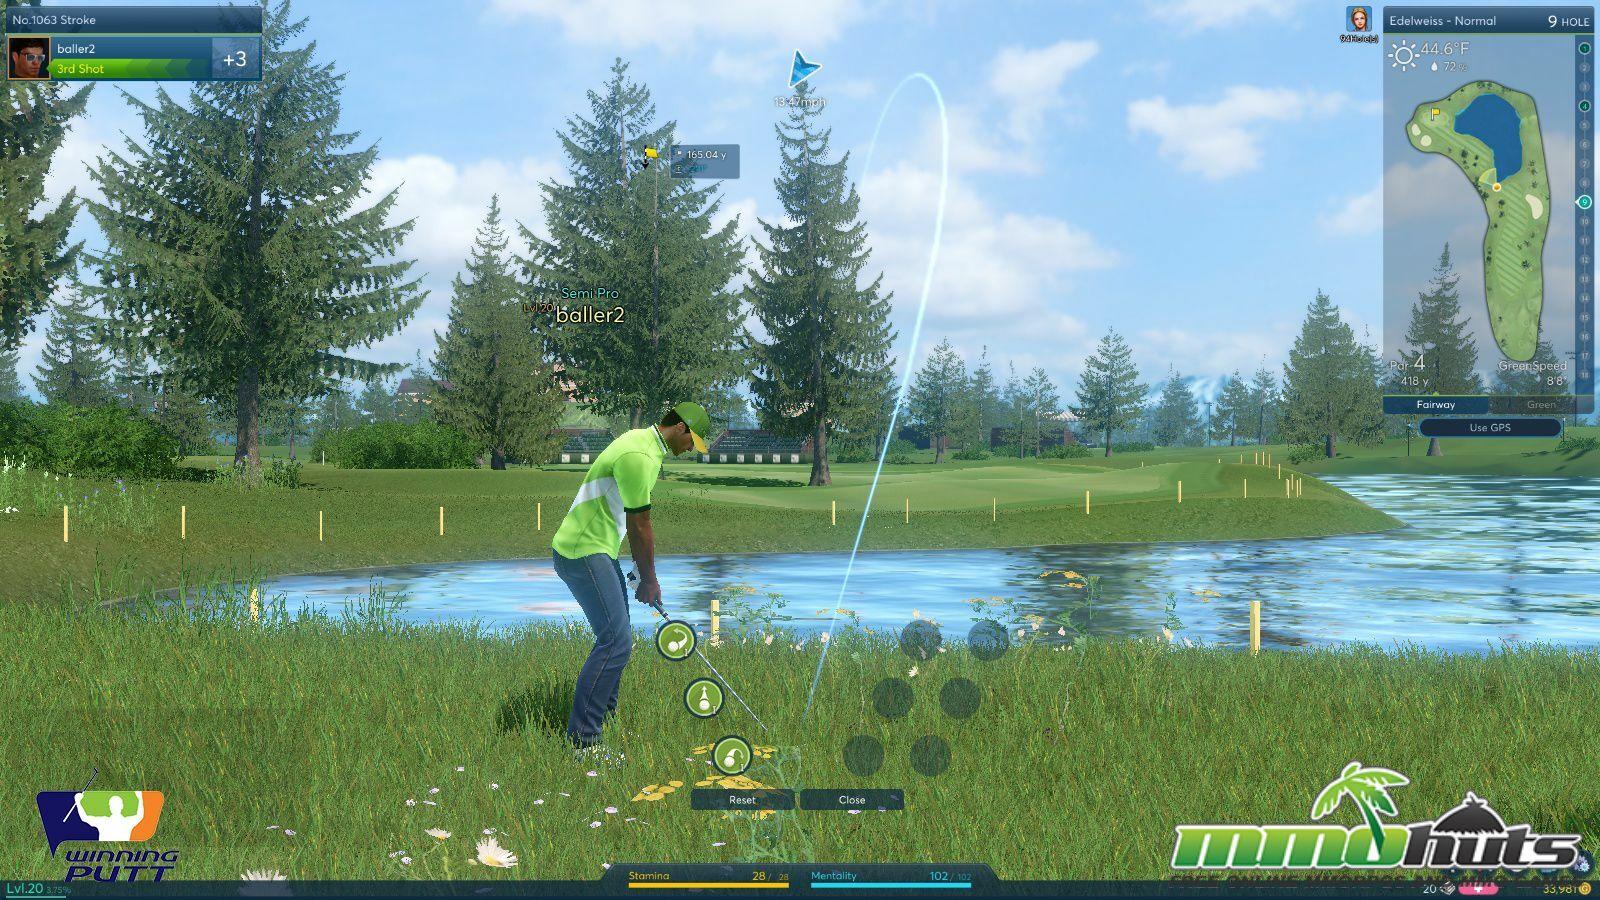 Winning Putt Preview Screenshot 10 Gameplay Guy Beautiful Course